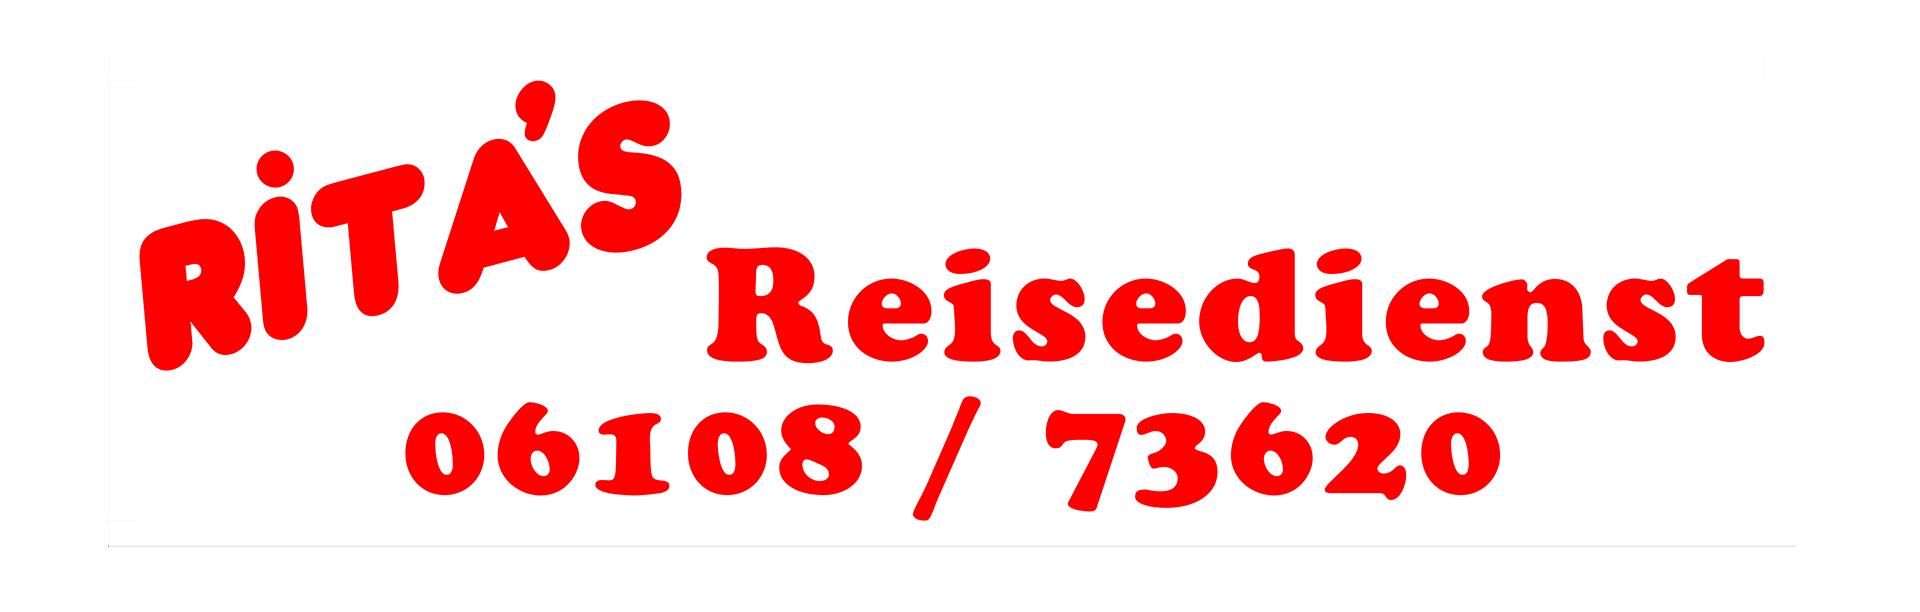 Rita's Reisedienst GmbH